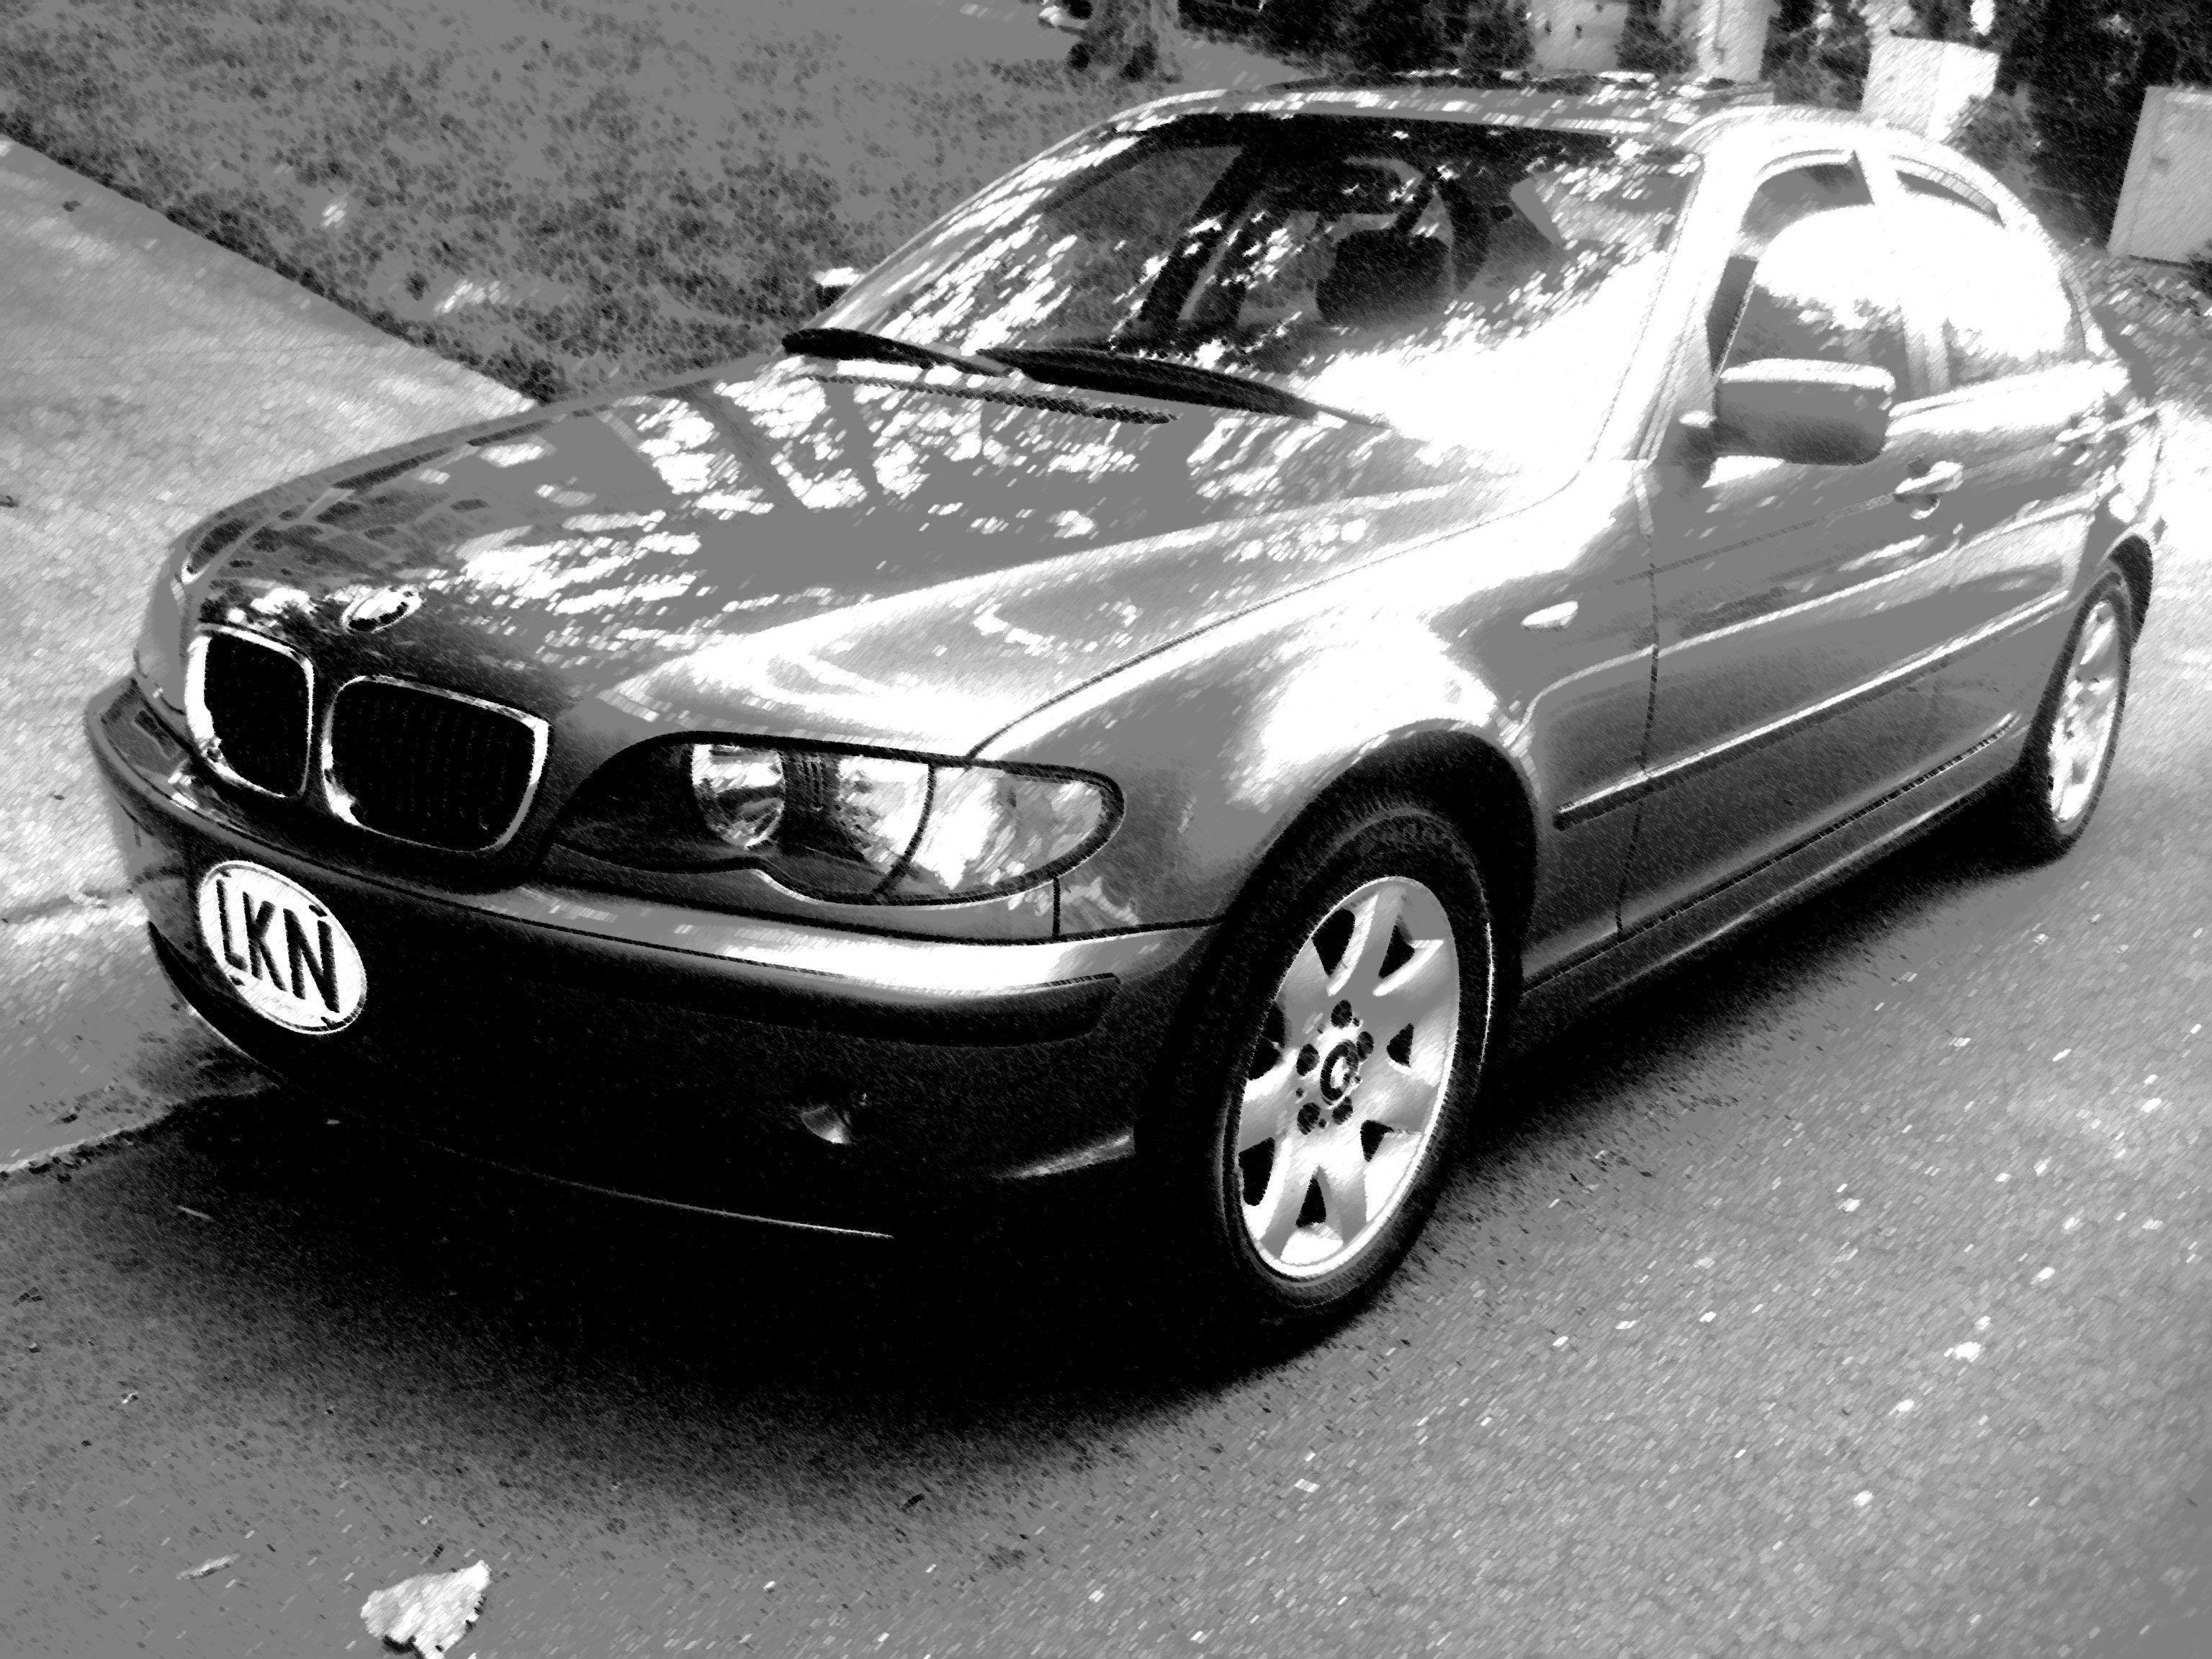 My first BMW. :)